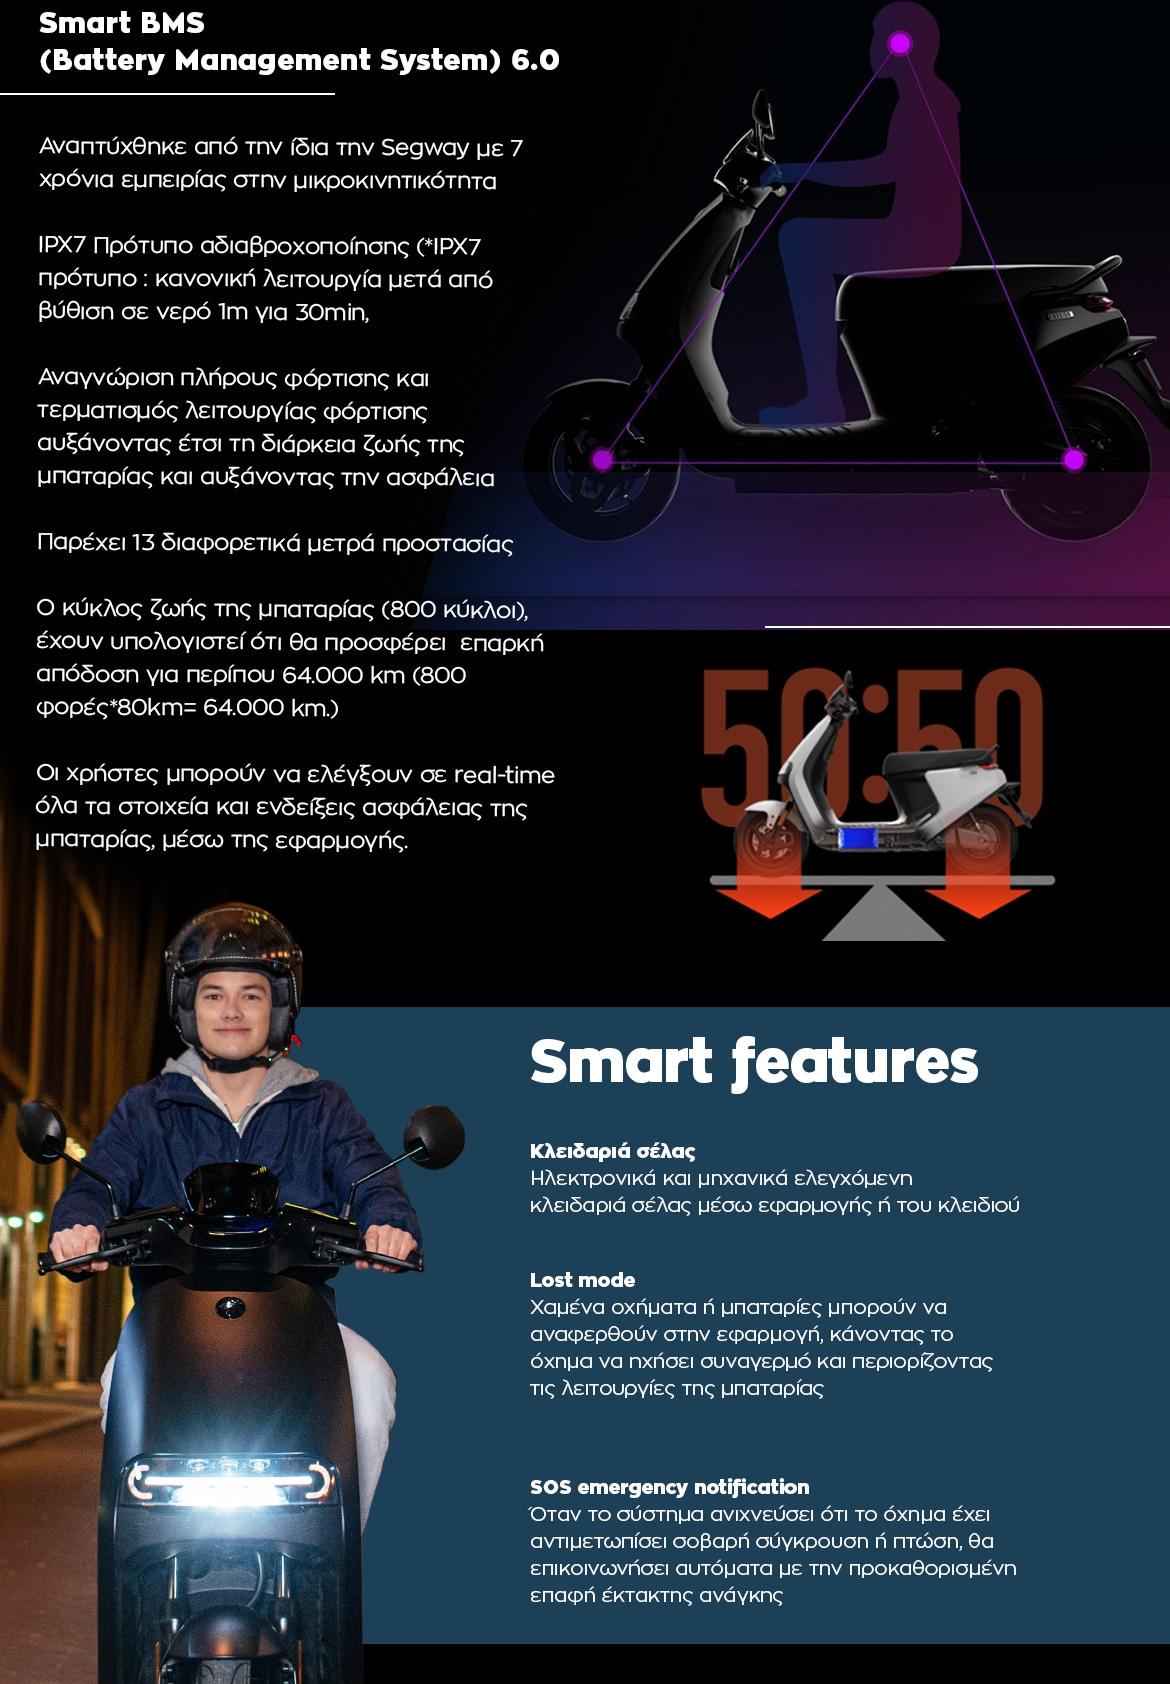 Smart BMS (Battery Management System) - Smart features